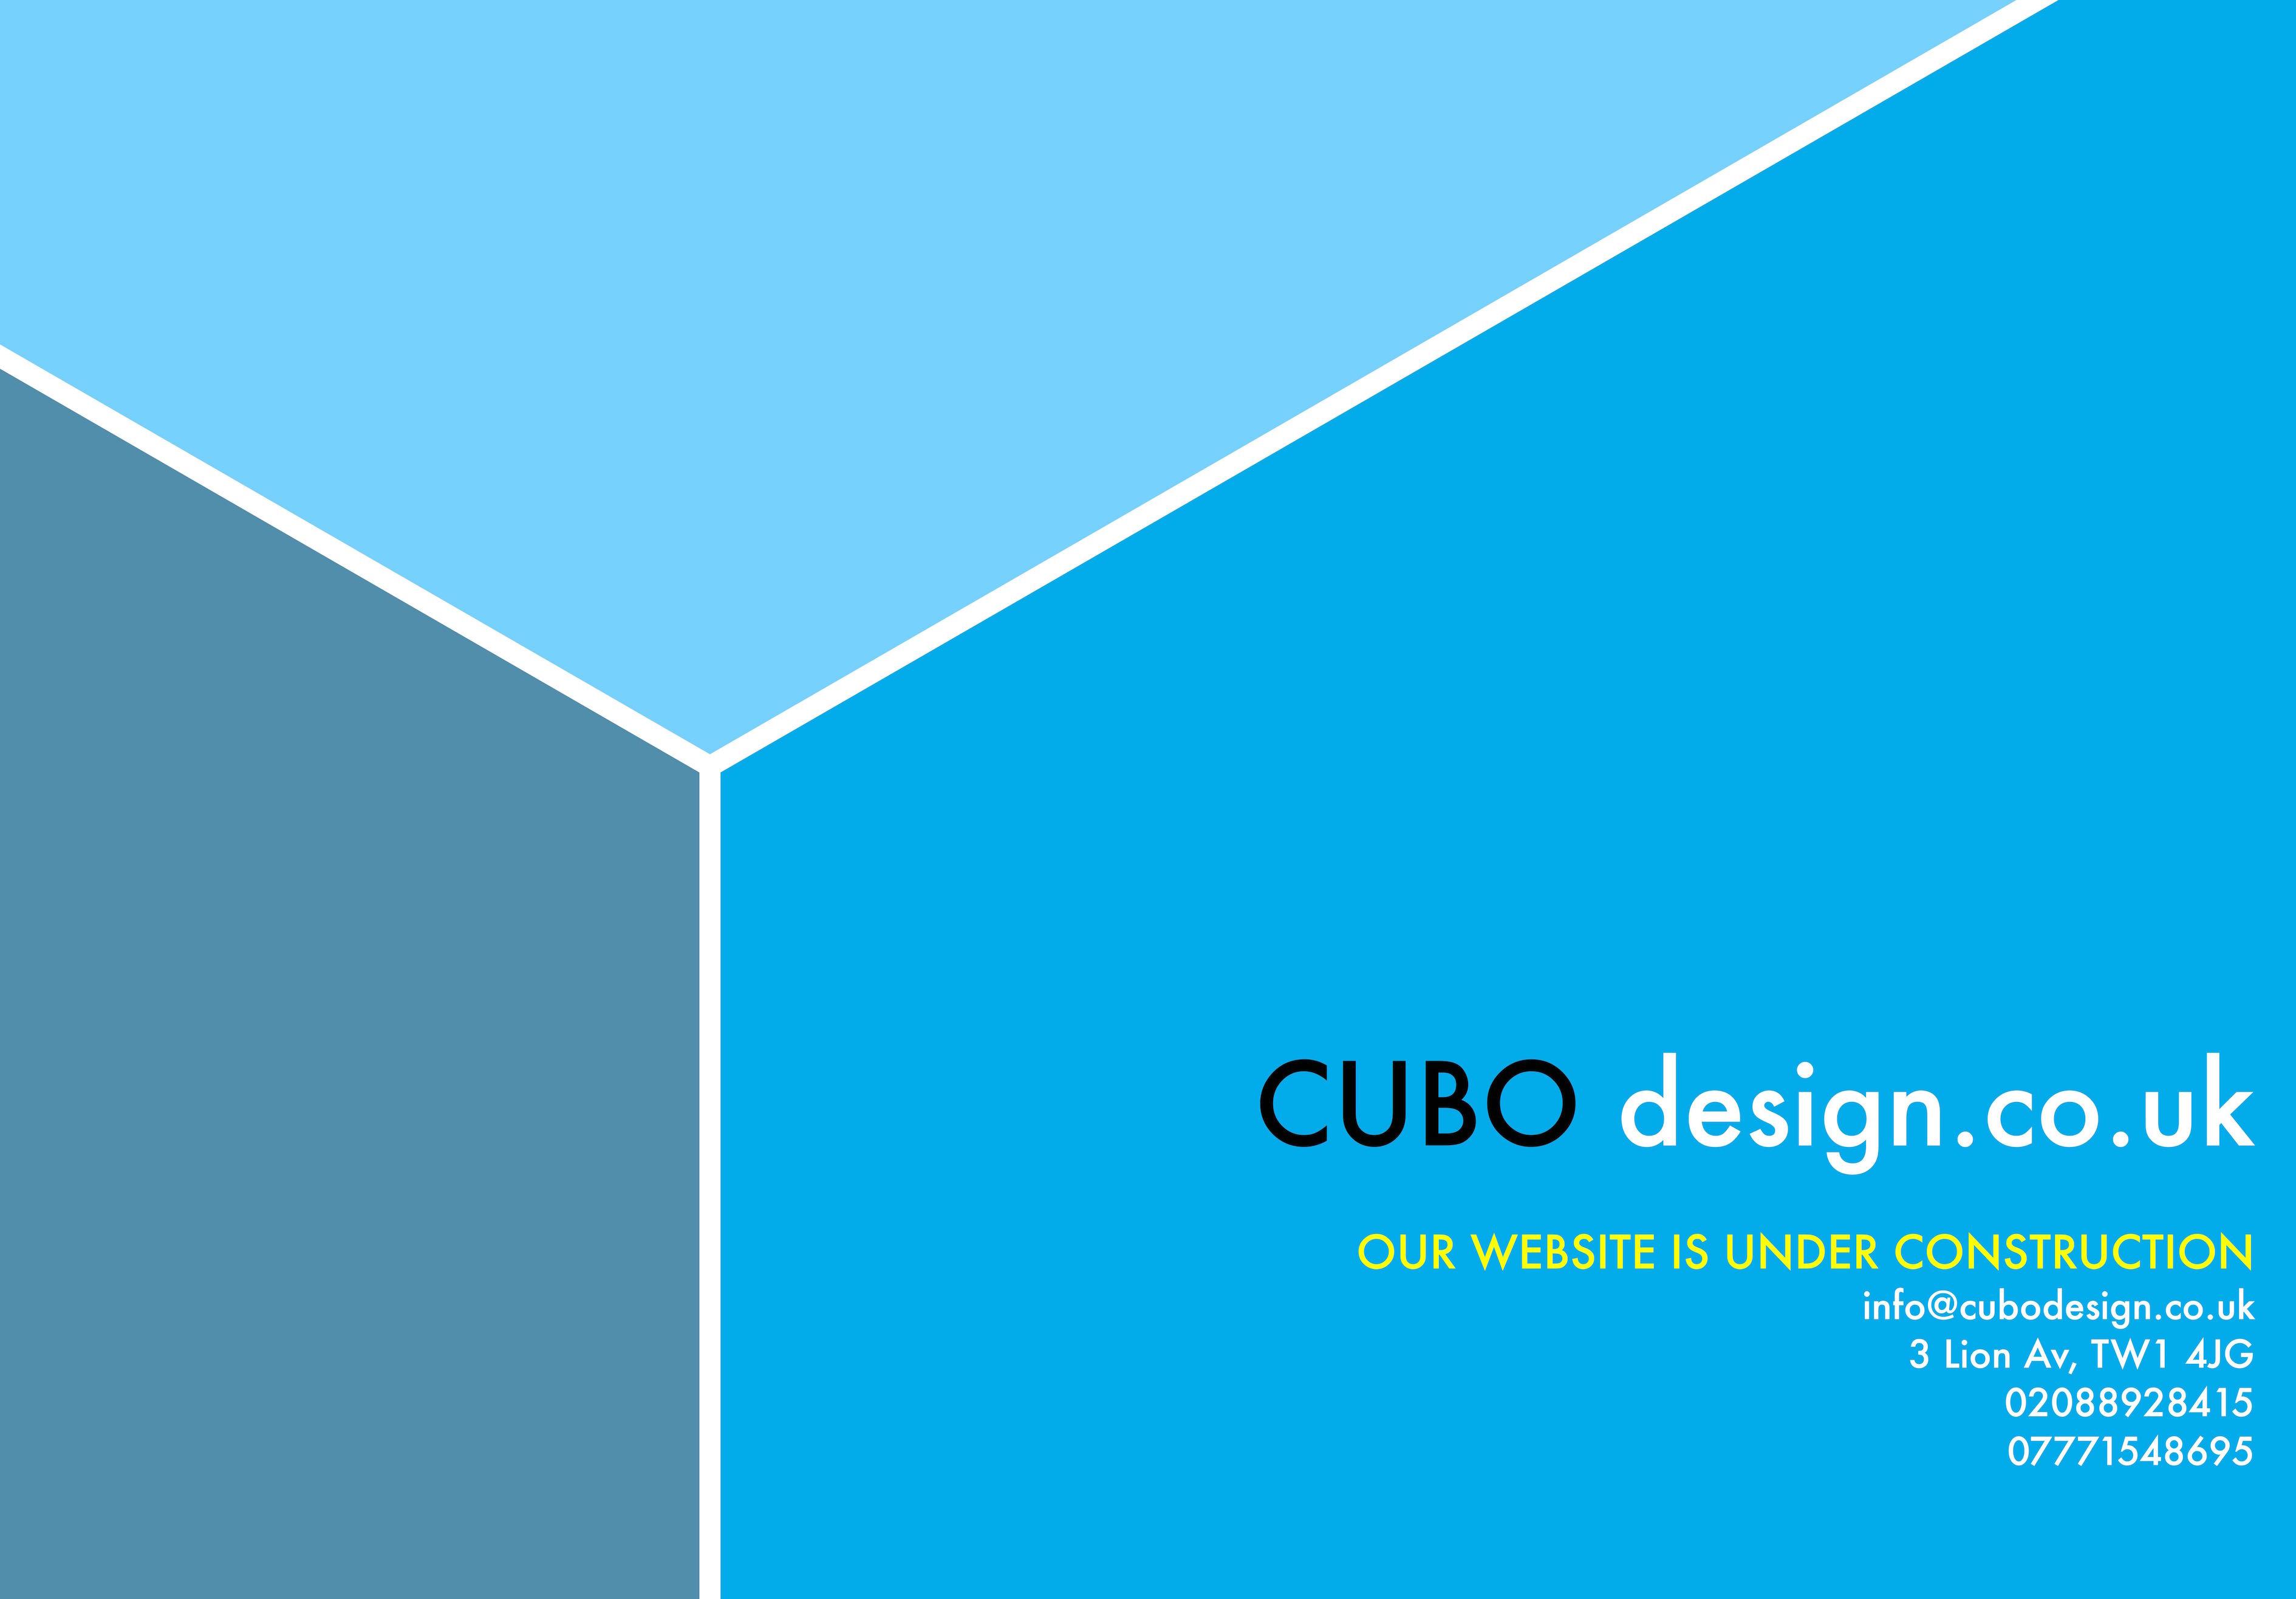 smal goldo_Cubo design logo copy